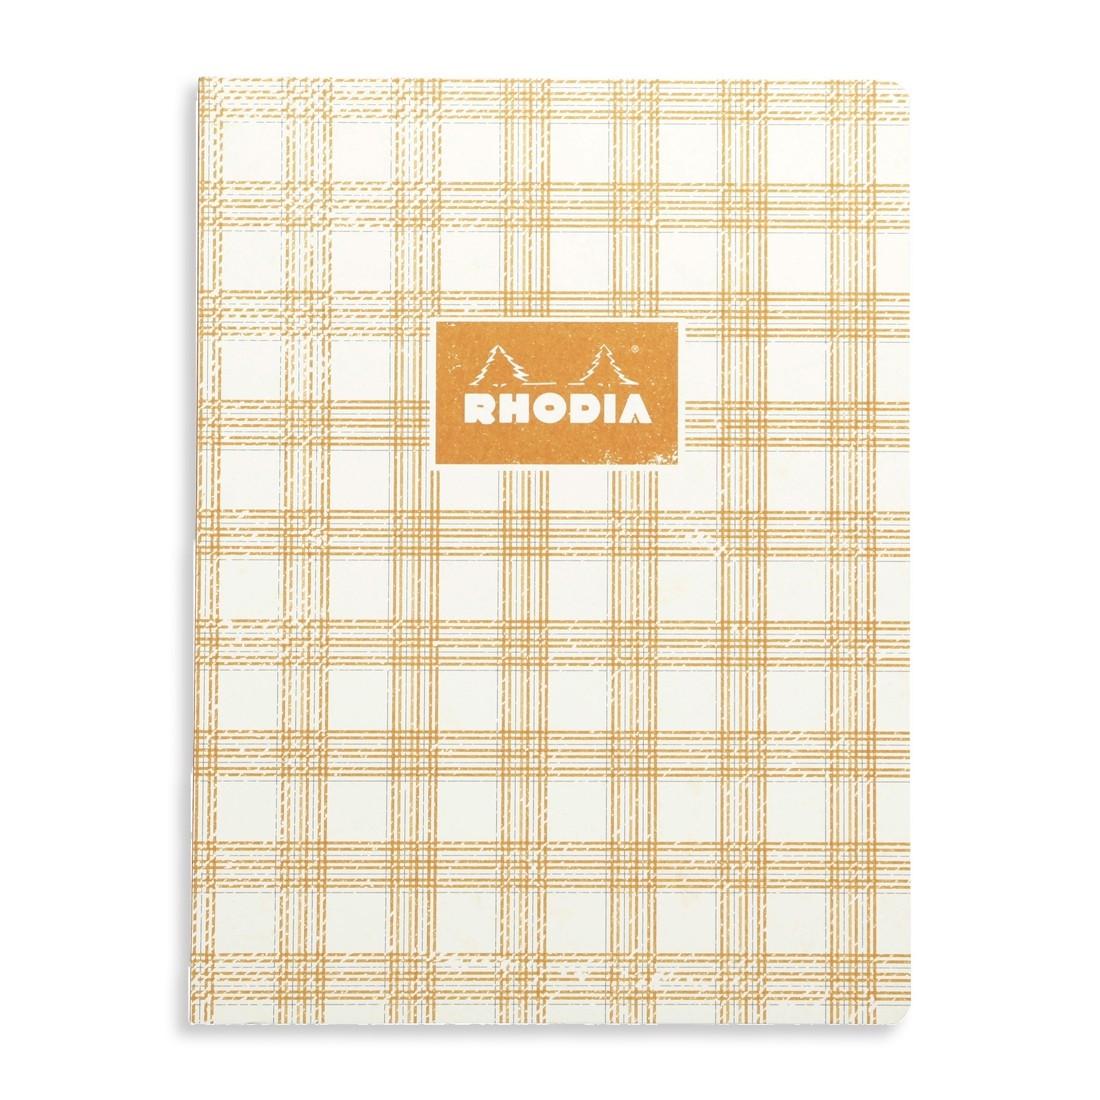 Rhodia Heritage Notebook - Ivory Tartan